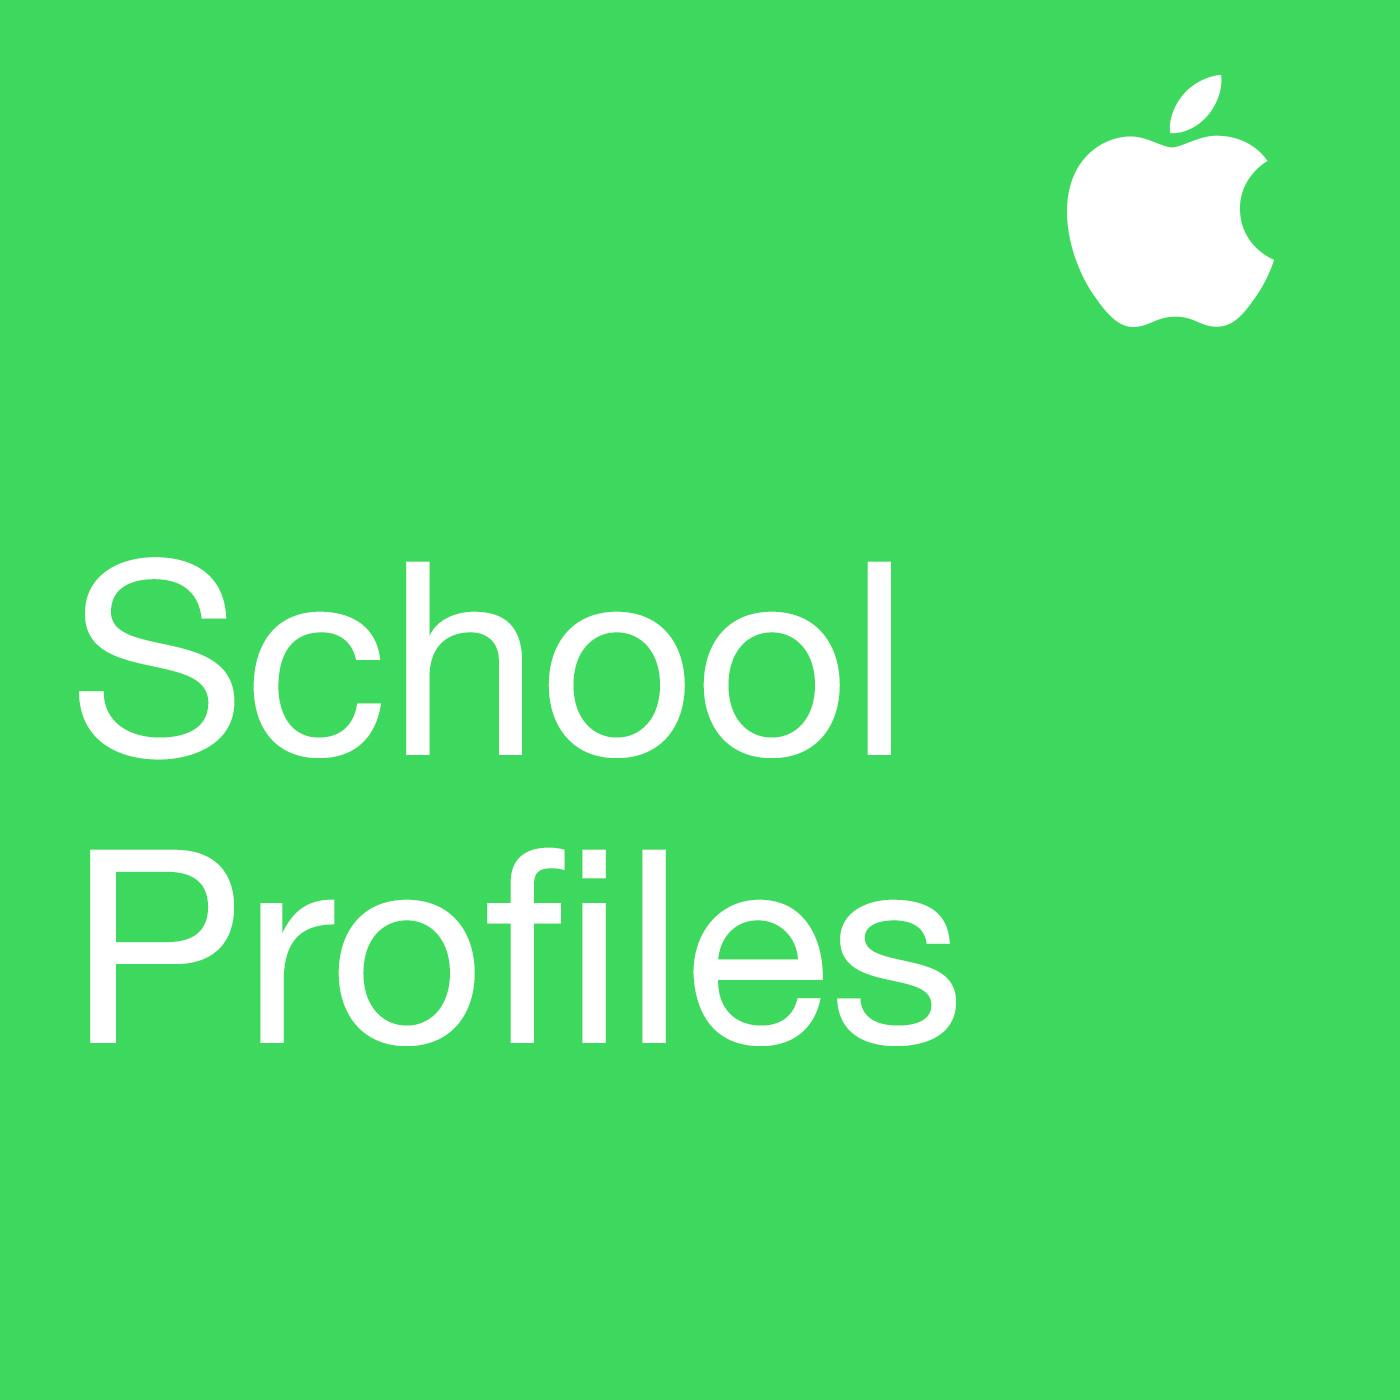 School Profiles